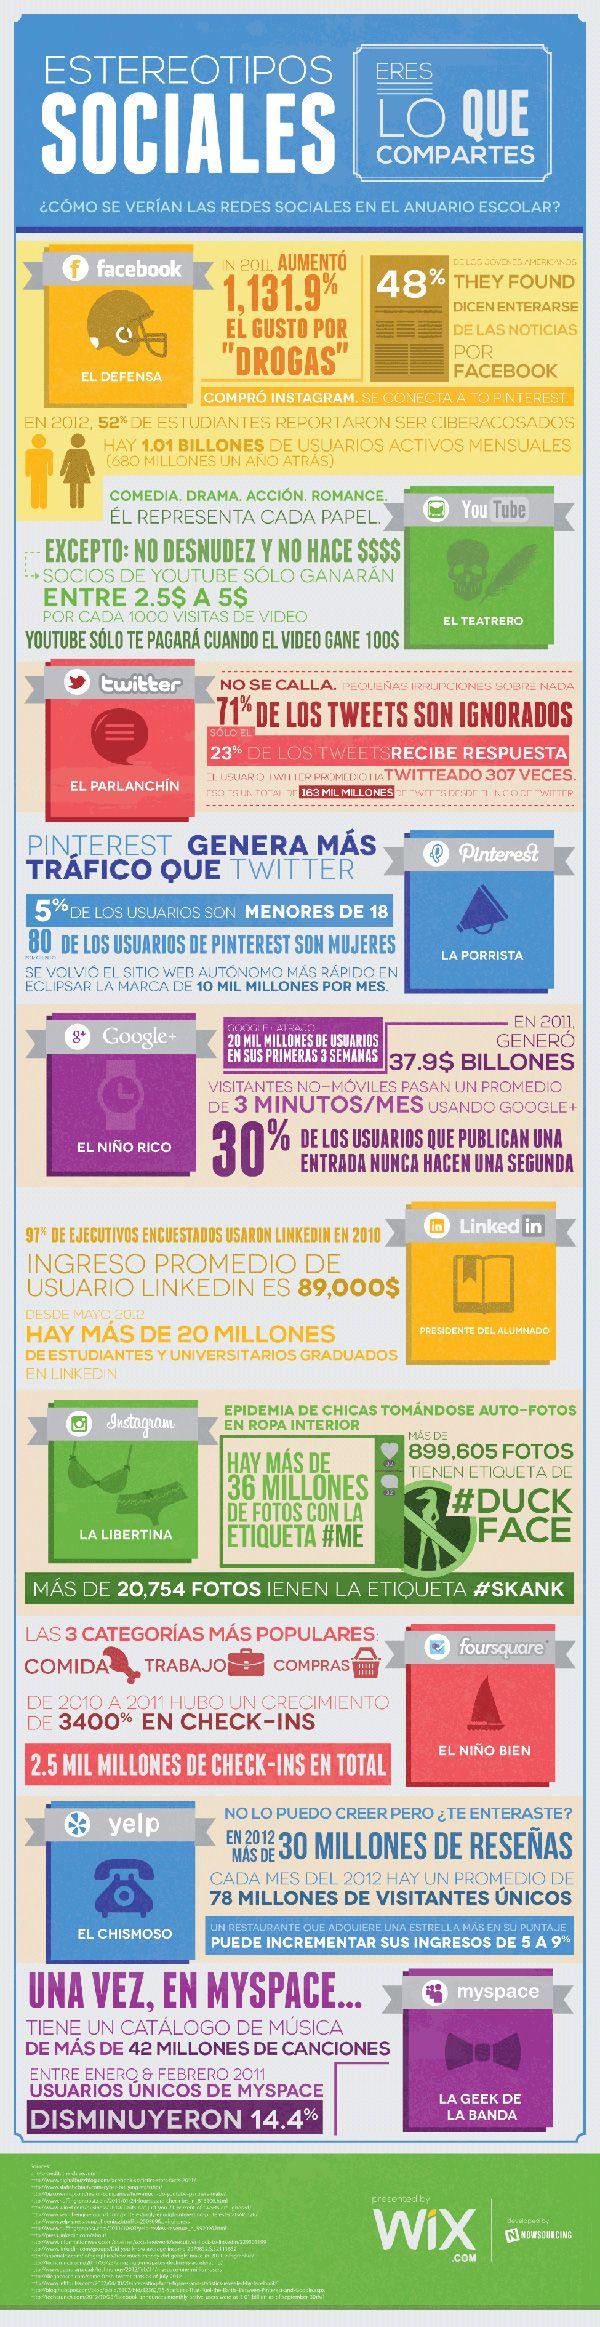 Estereotipos sociales #infografia #rulessms